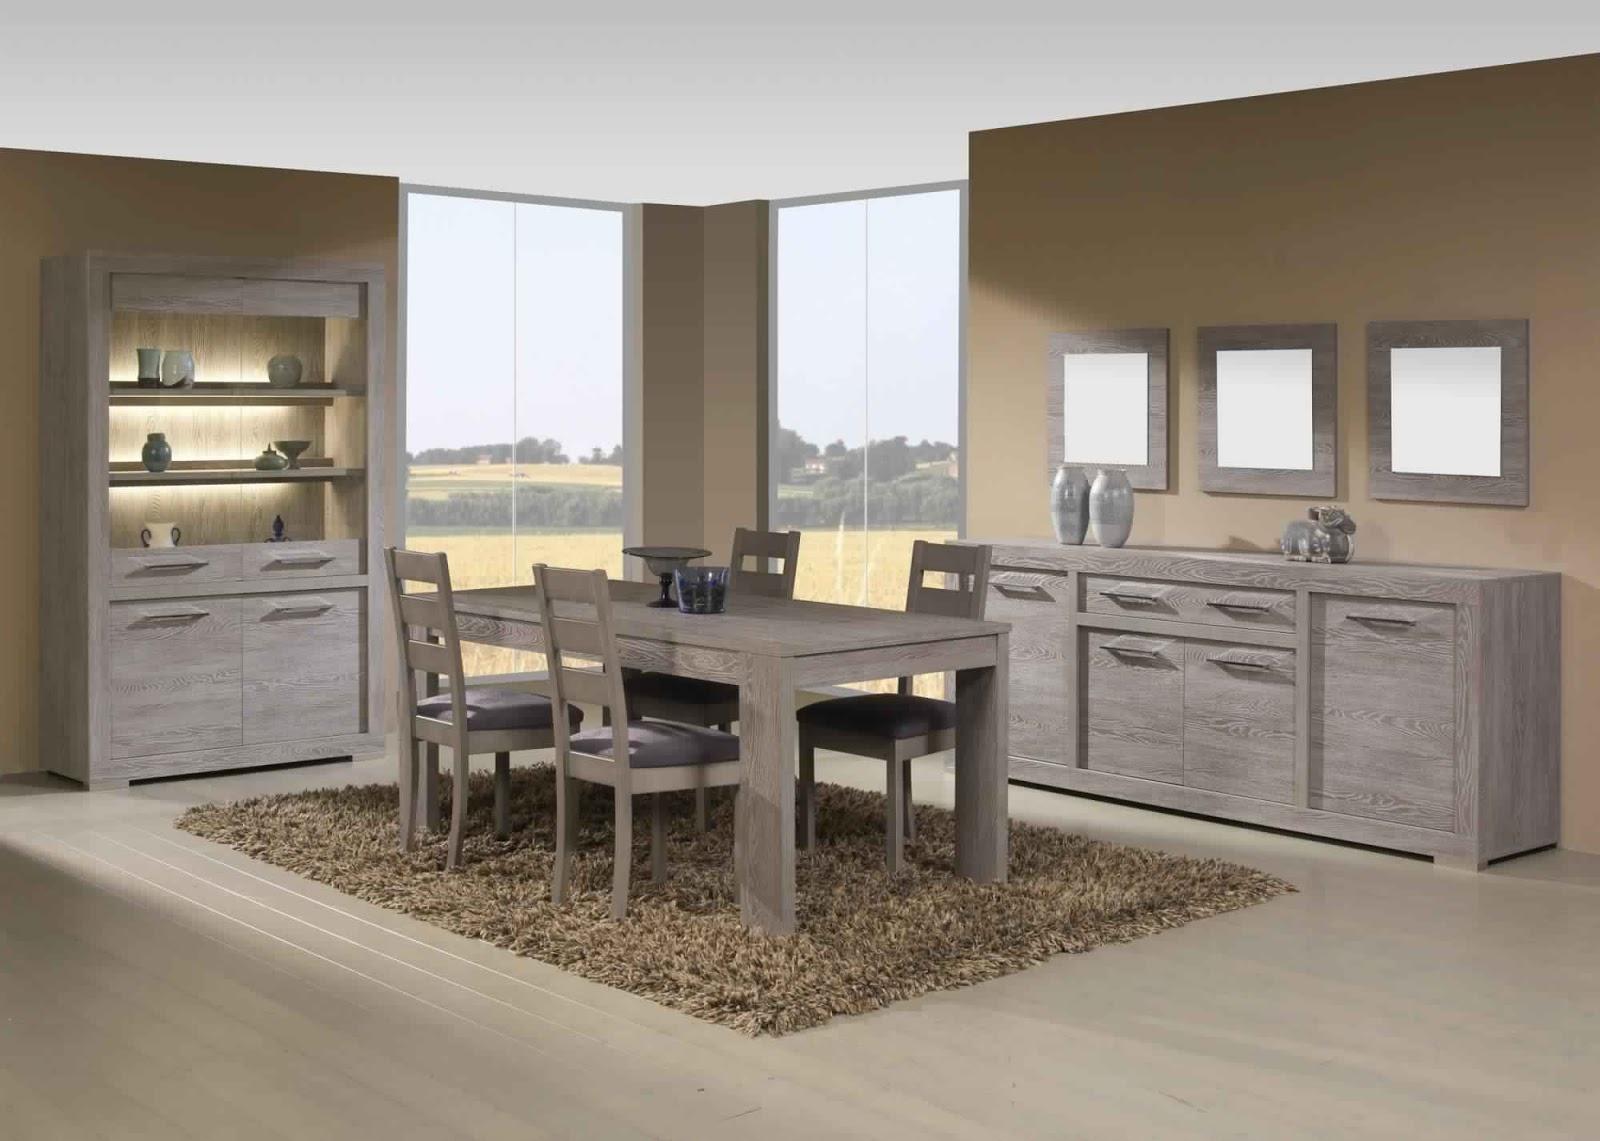 meuble salon salle a manger good salle a manger en pin blanc salle manger bois large choix de. Black Bedroom Furniture Sets. Home Design Ideas